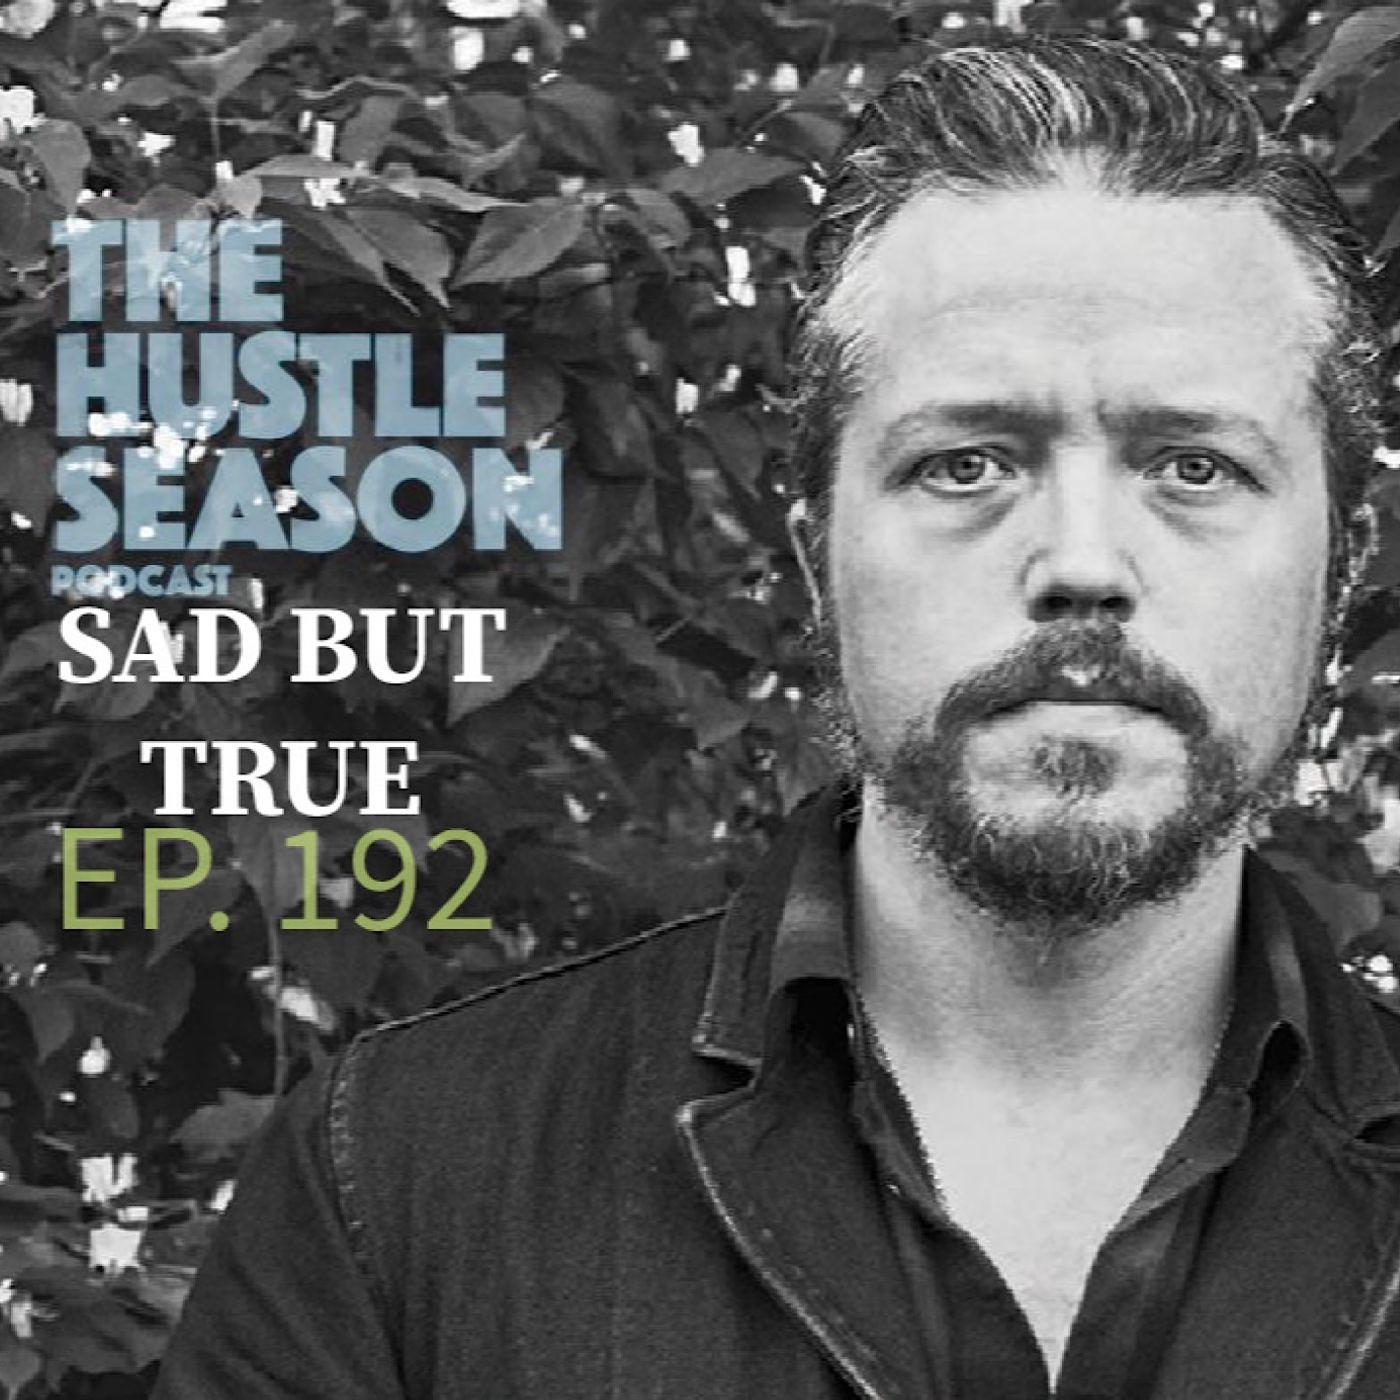 The Hustle Season: Ep. 192 Sad But True